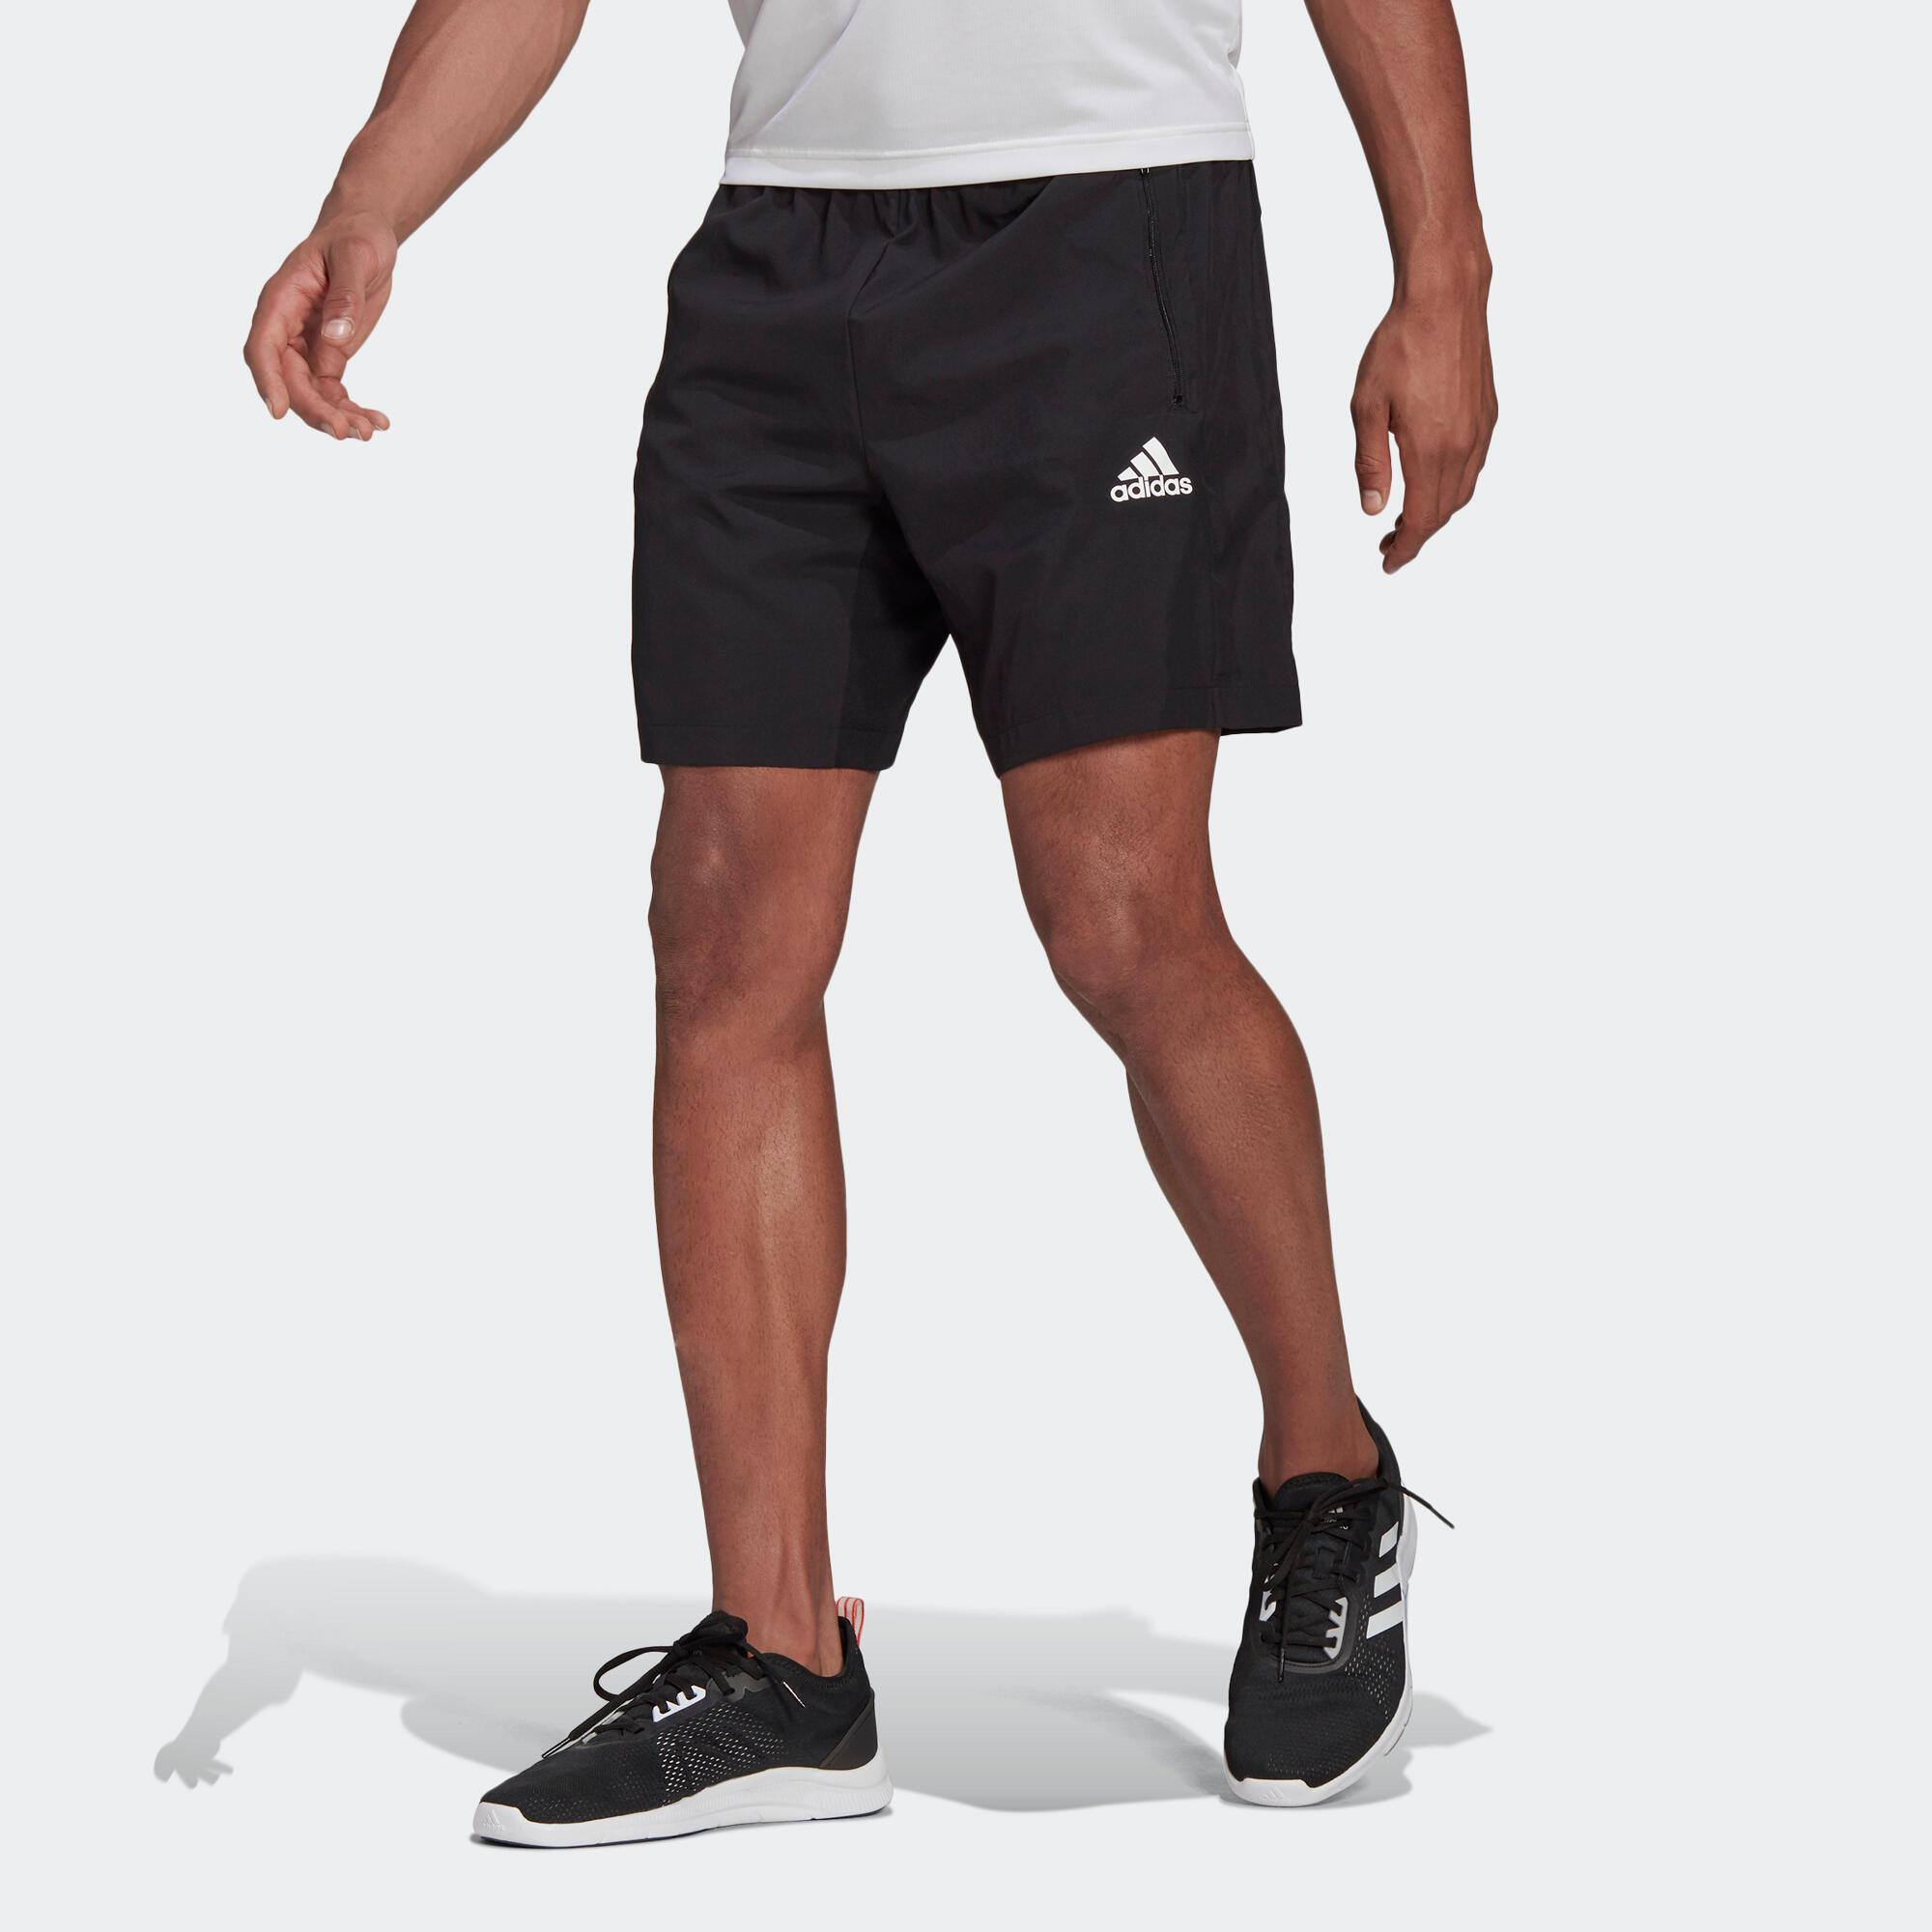 Şort Adidas Negru Damă imagine